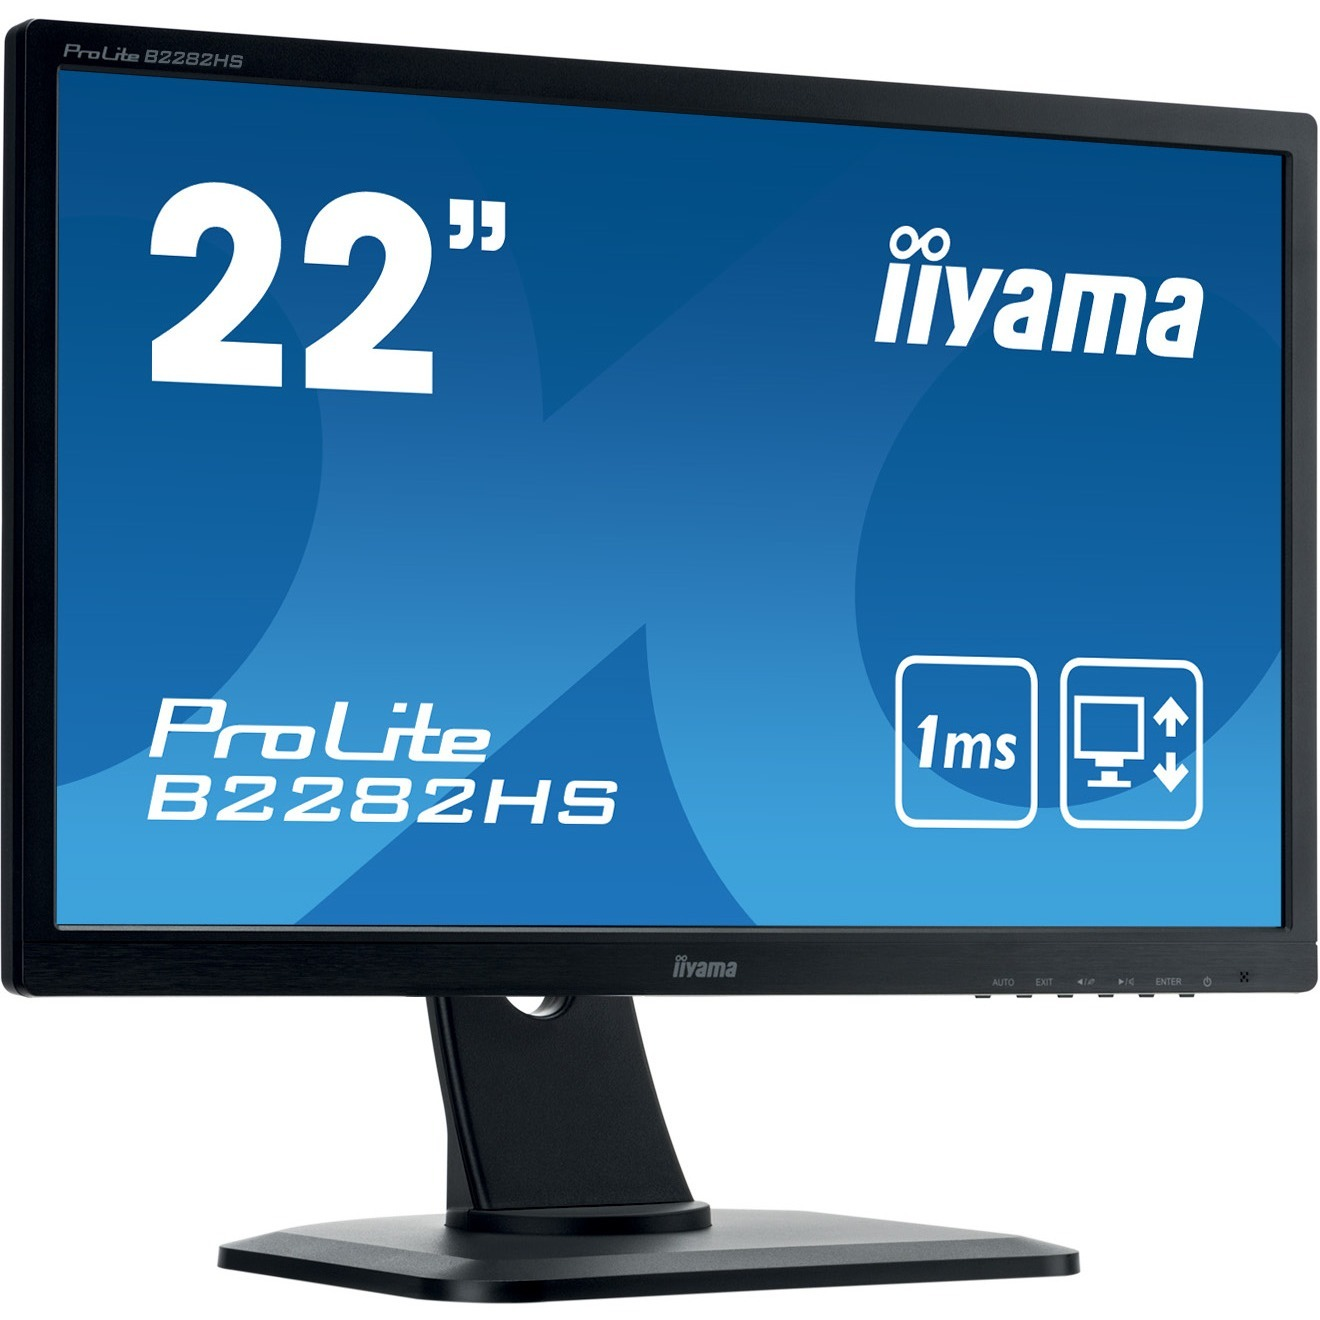 iiyama ProLite B2282HS-B1 21.5inch WLED LCD Monitor - 16:9 - 1 ms